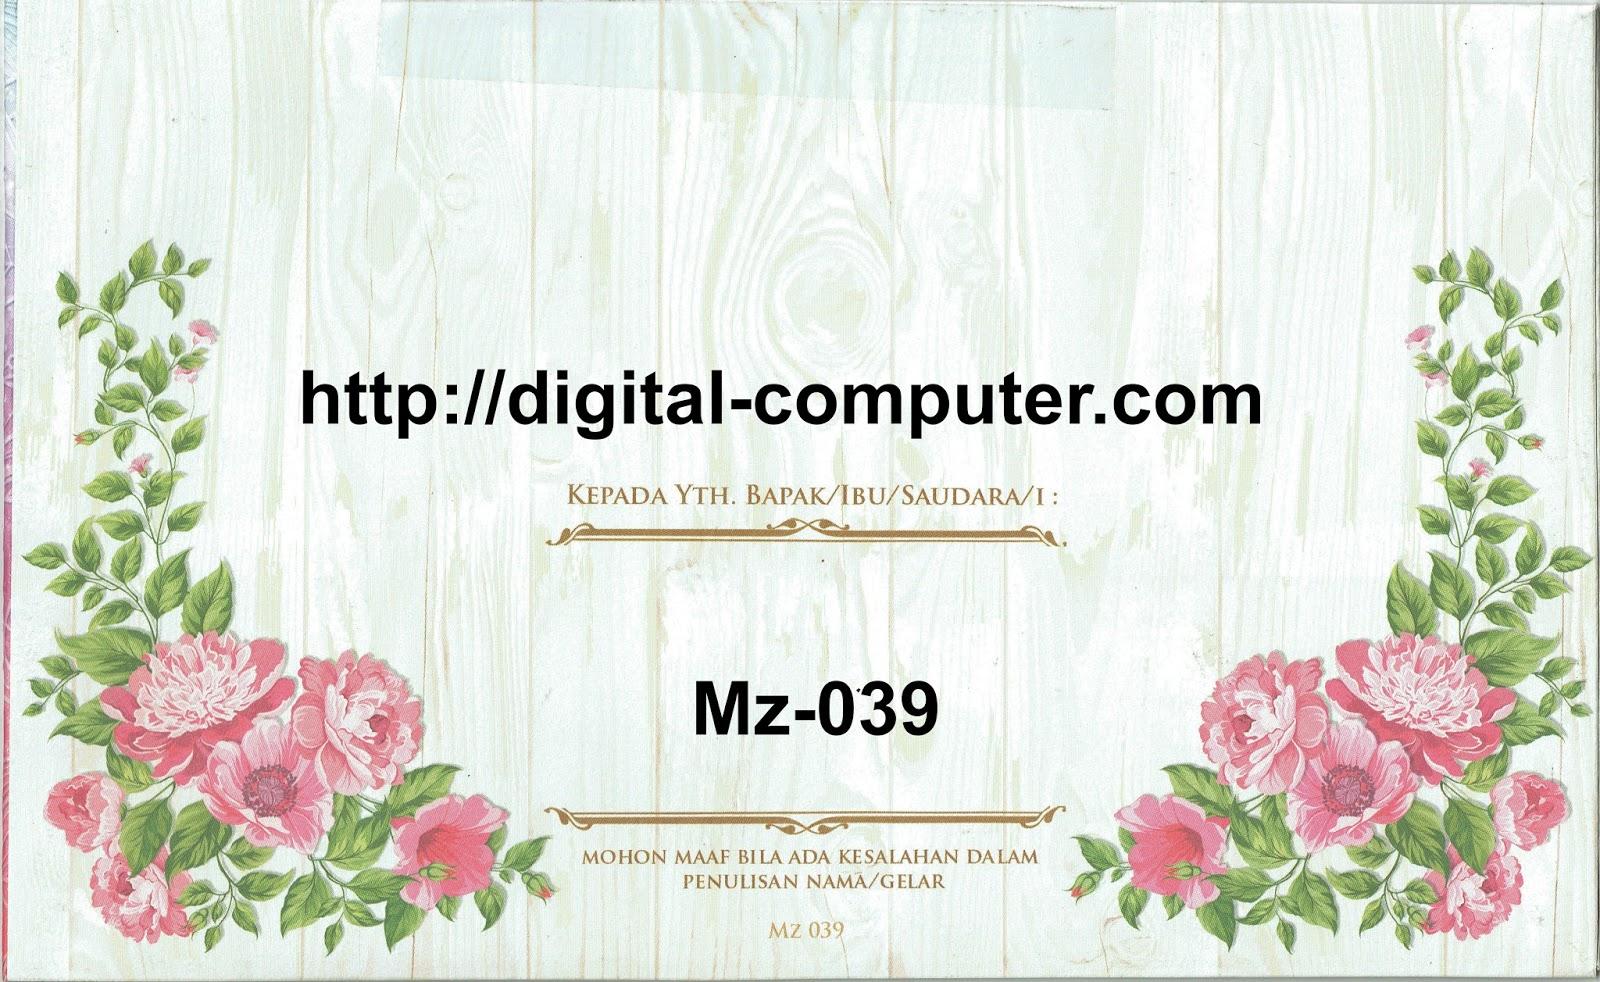 Undangan Softcover Mz-039